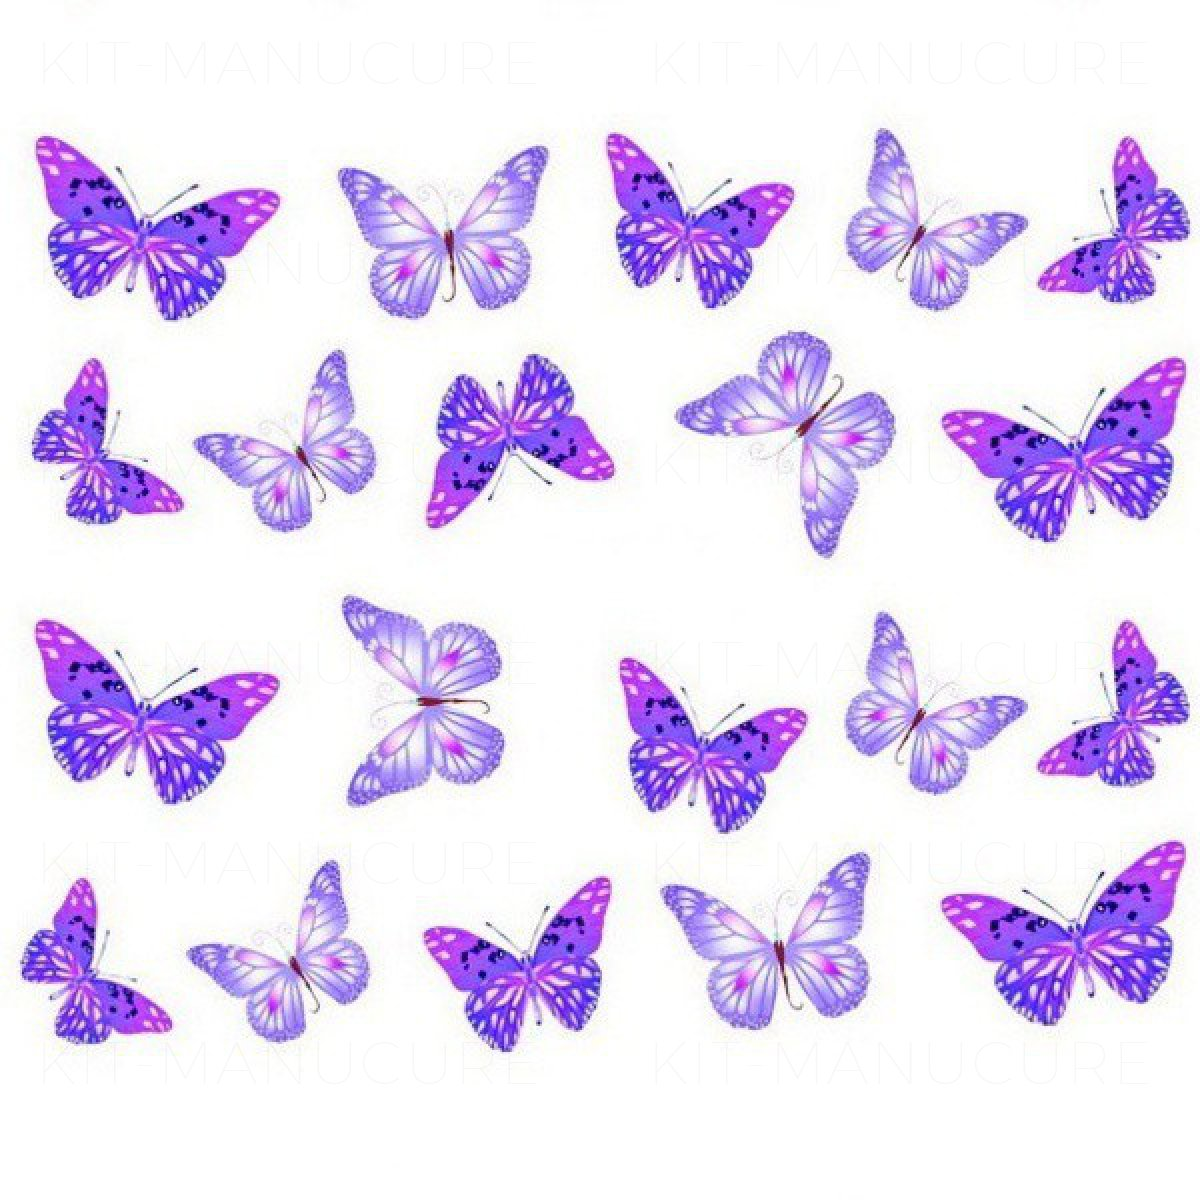 https://www.kit-manucure.com/1270-thickbox_default/water-decals-papillons-violet.jpg